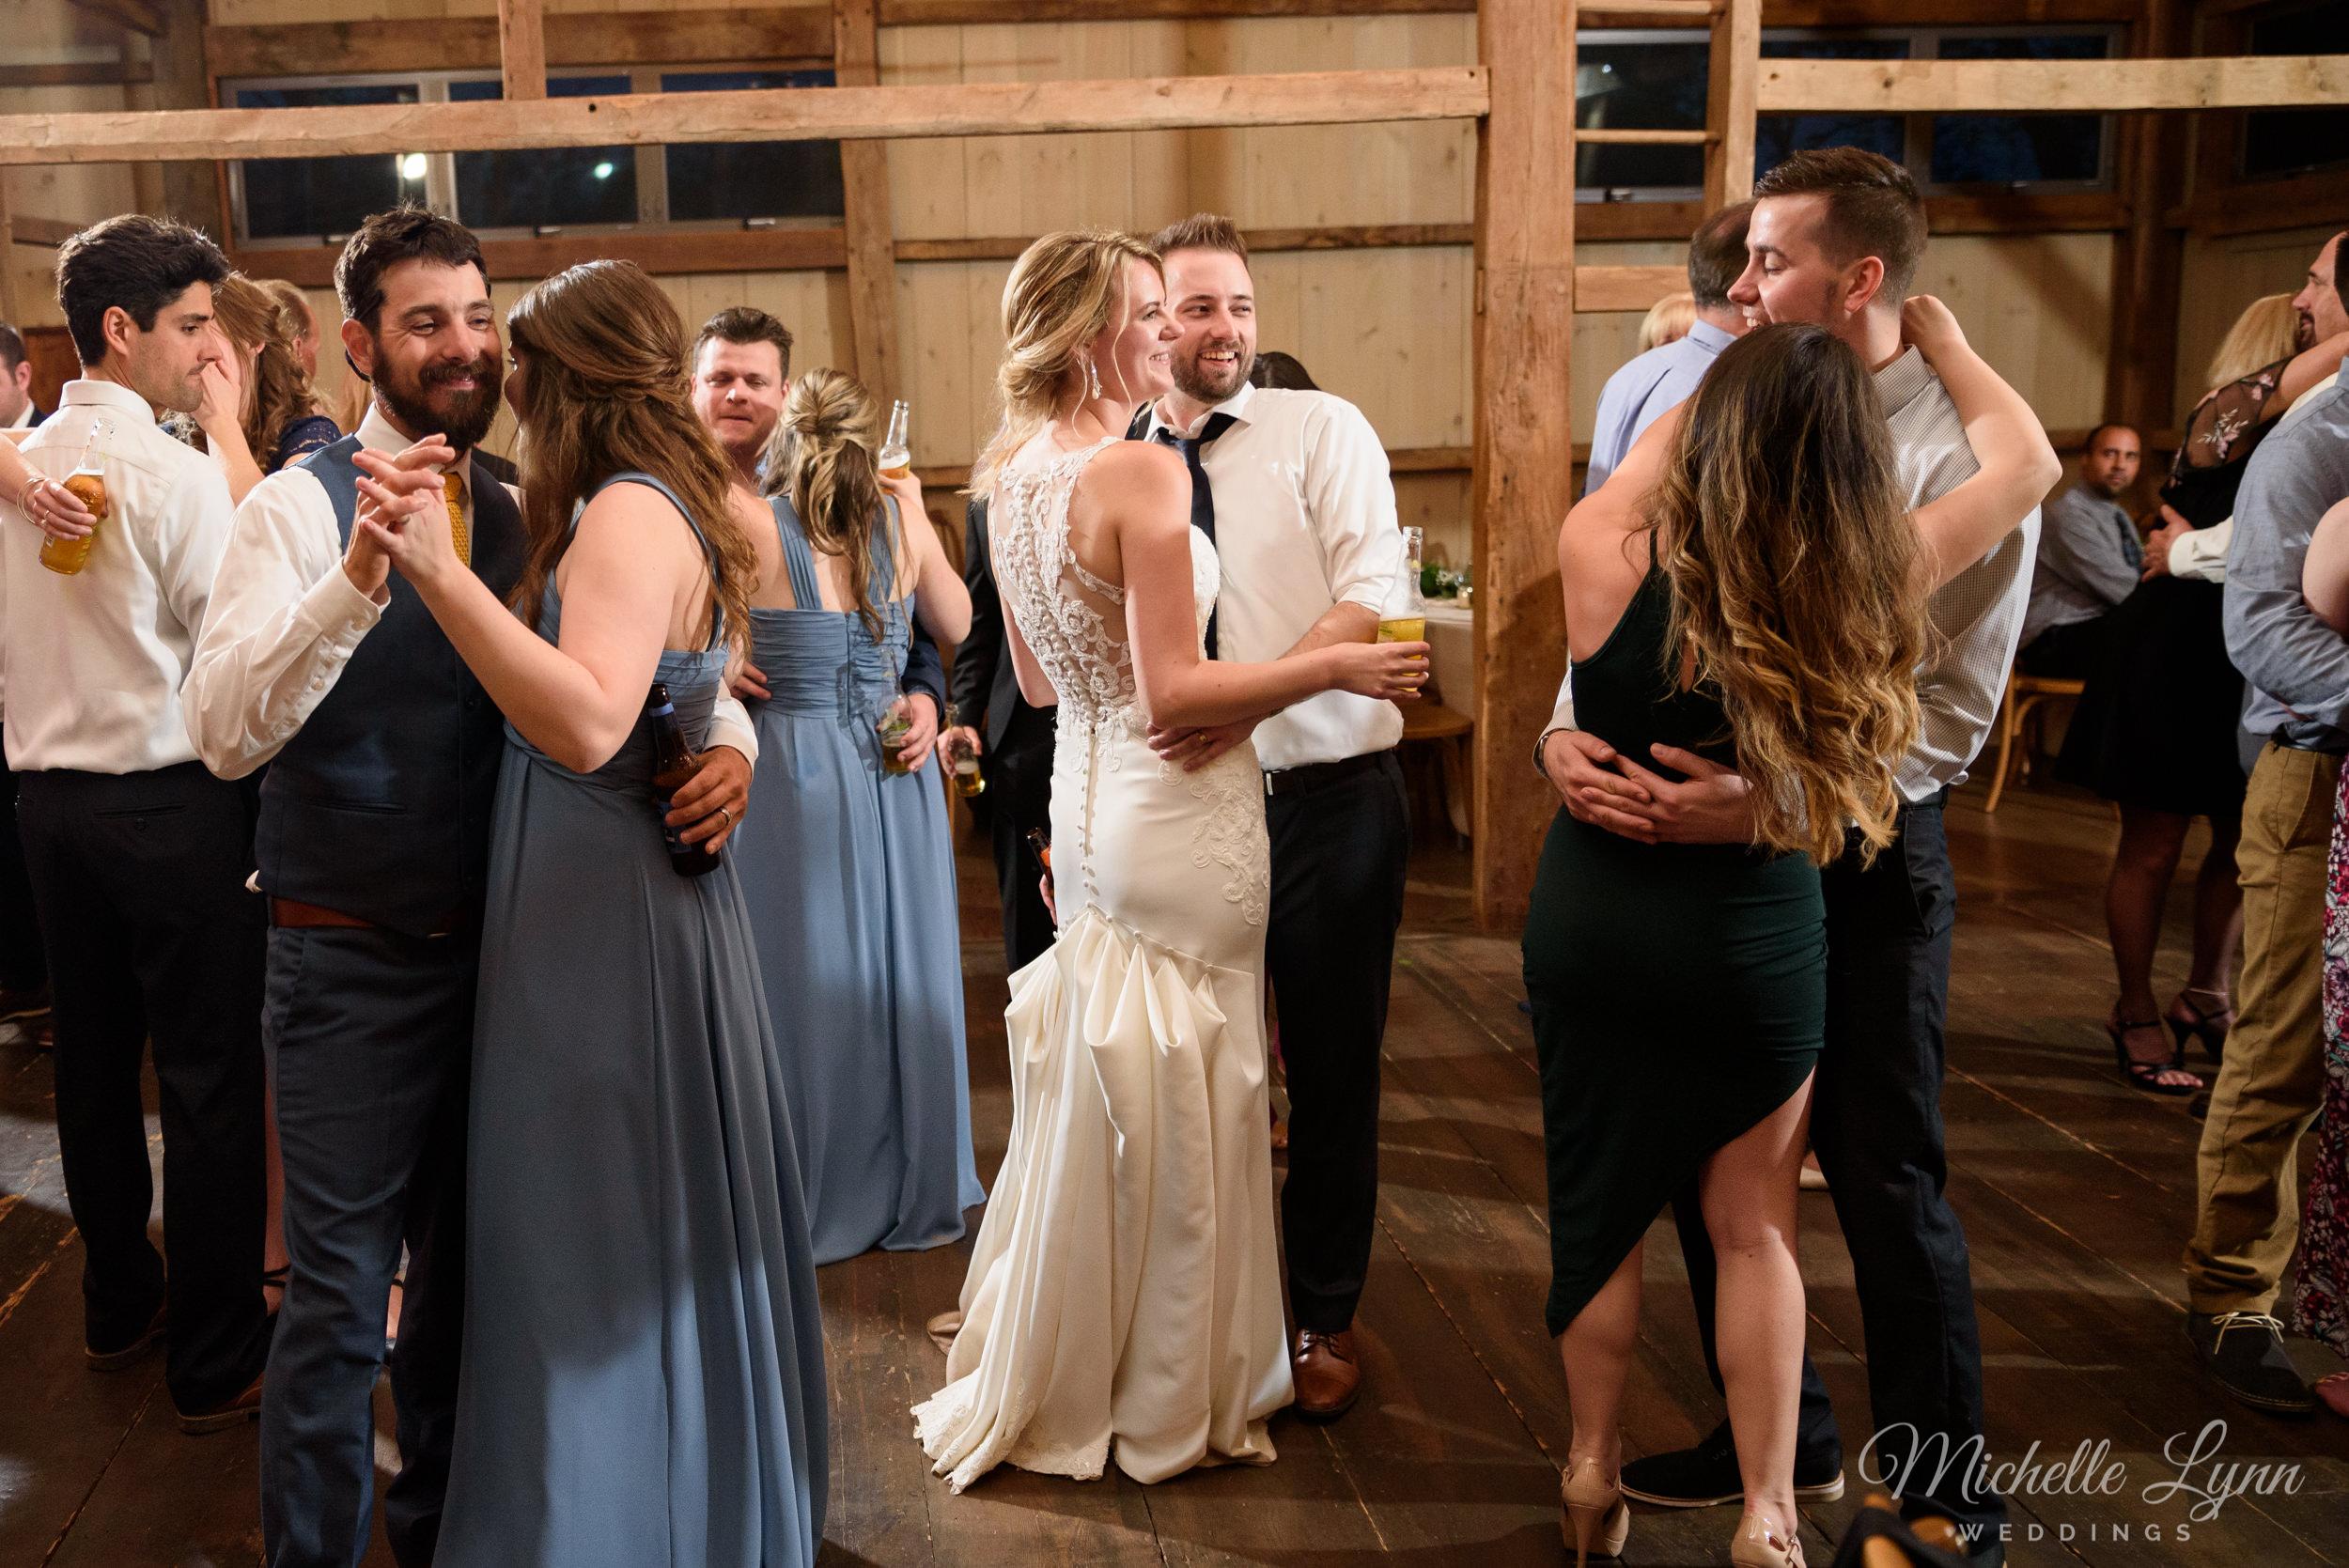 mlw-the-farm-bakery-and-events-wedding-photos-92.jpg